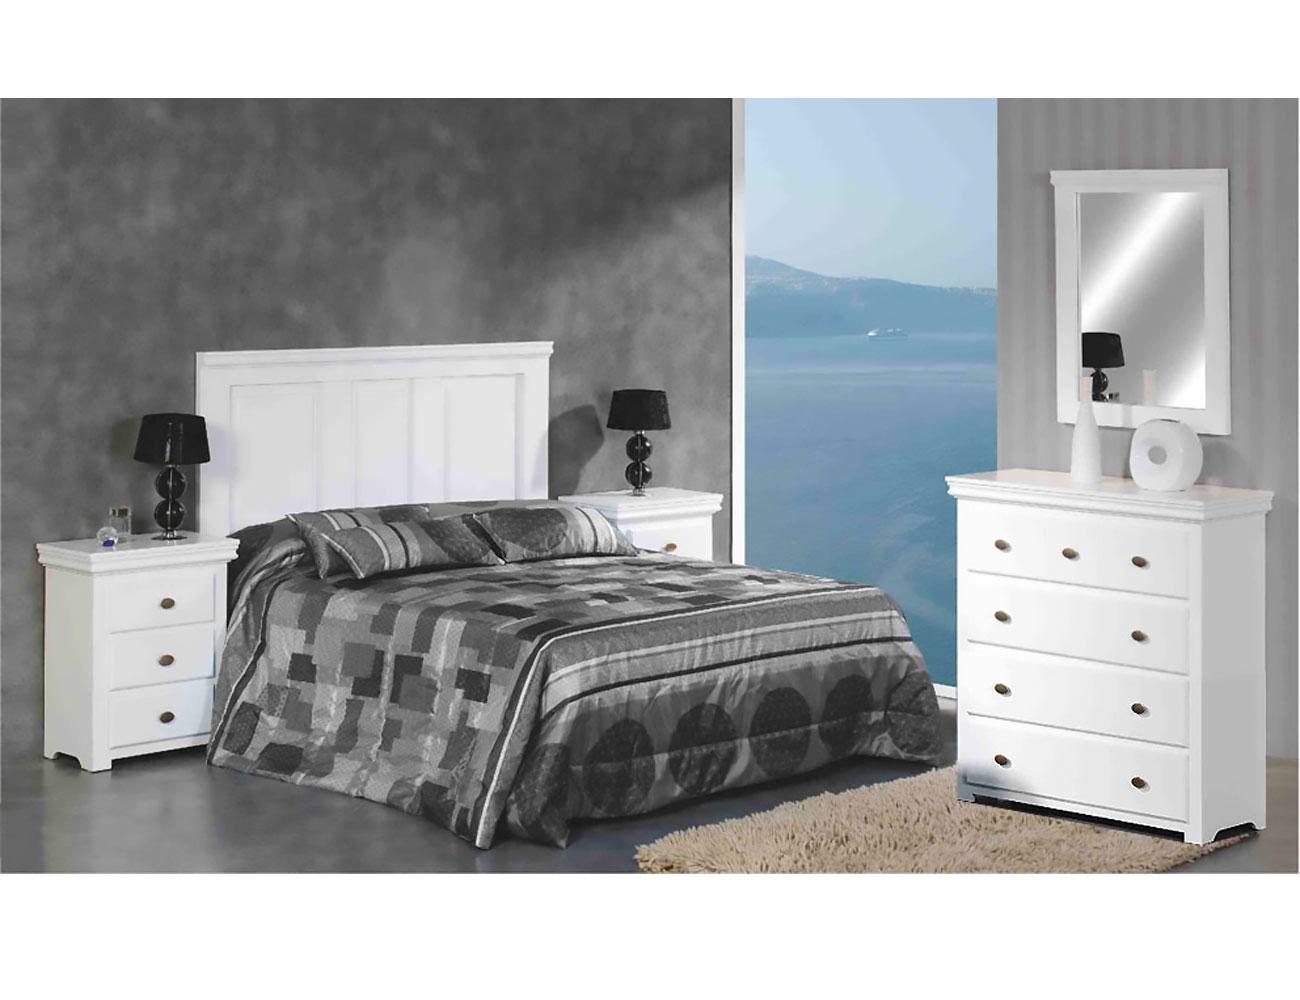 Dormitorio matrimonio comoda 5 c madera dm lacado blanco9